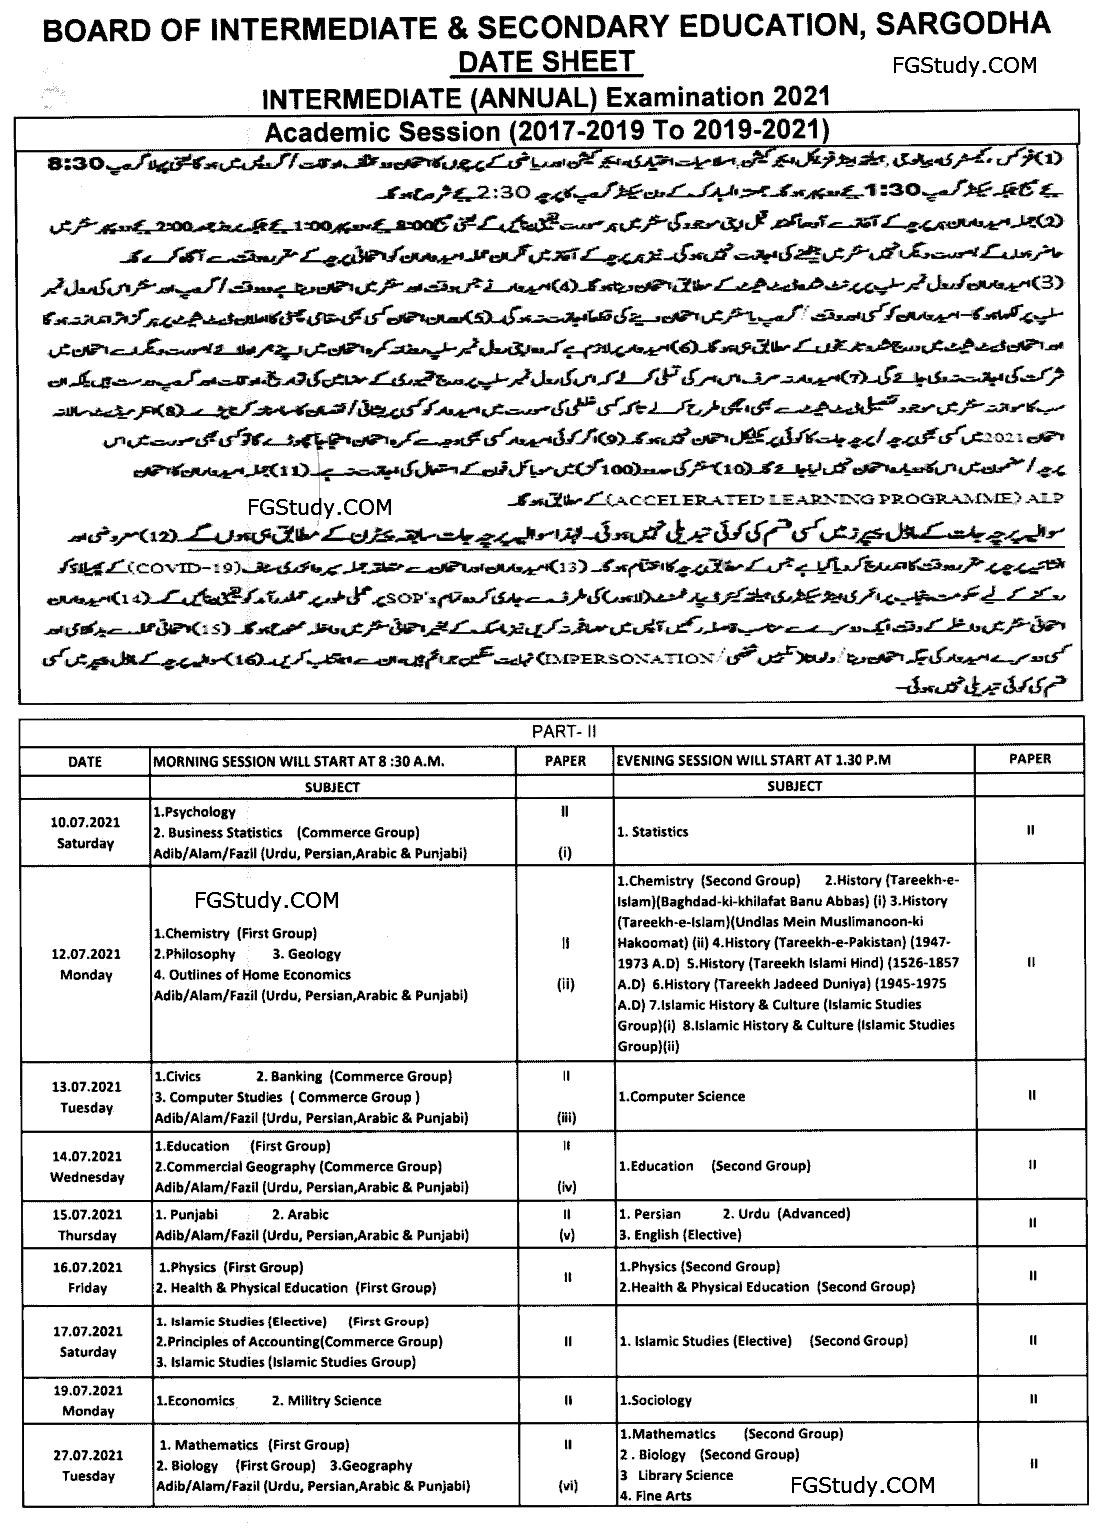 12th-class-date-sheet-sargodha-board-2021